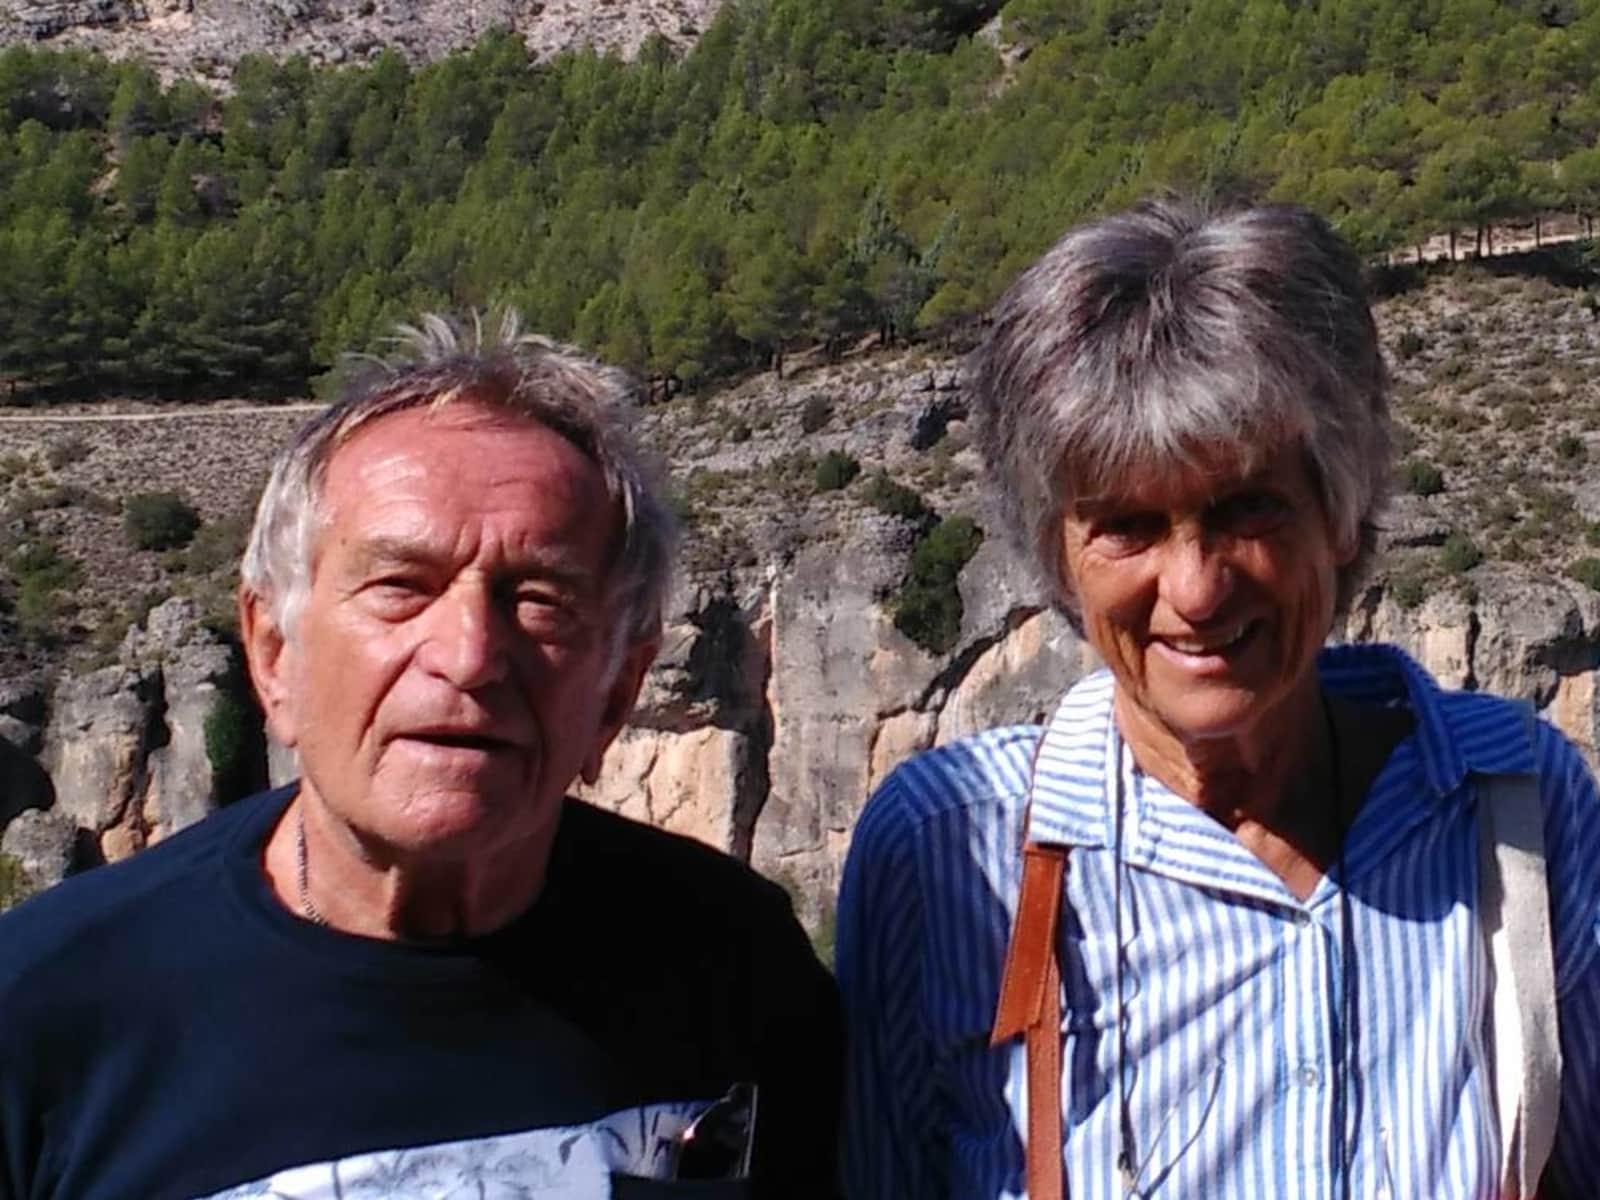 Ursula & Erwin from Biebesheim, Germany